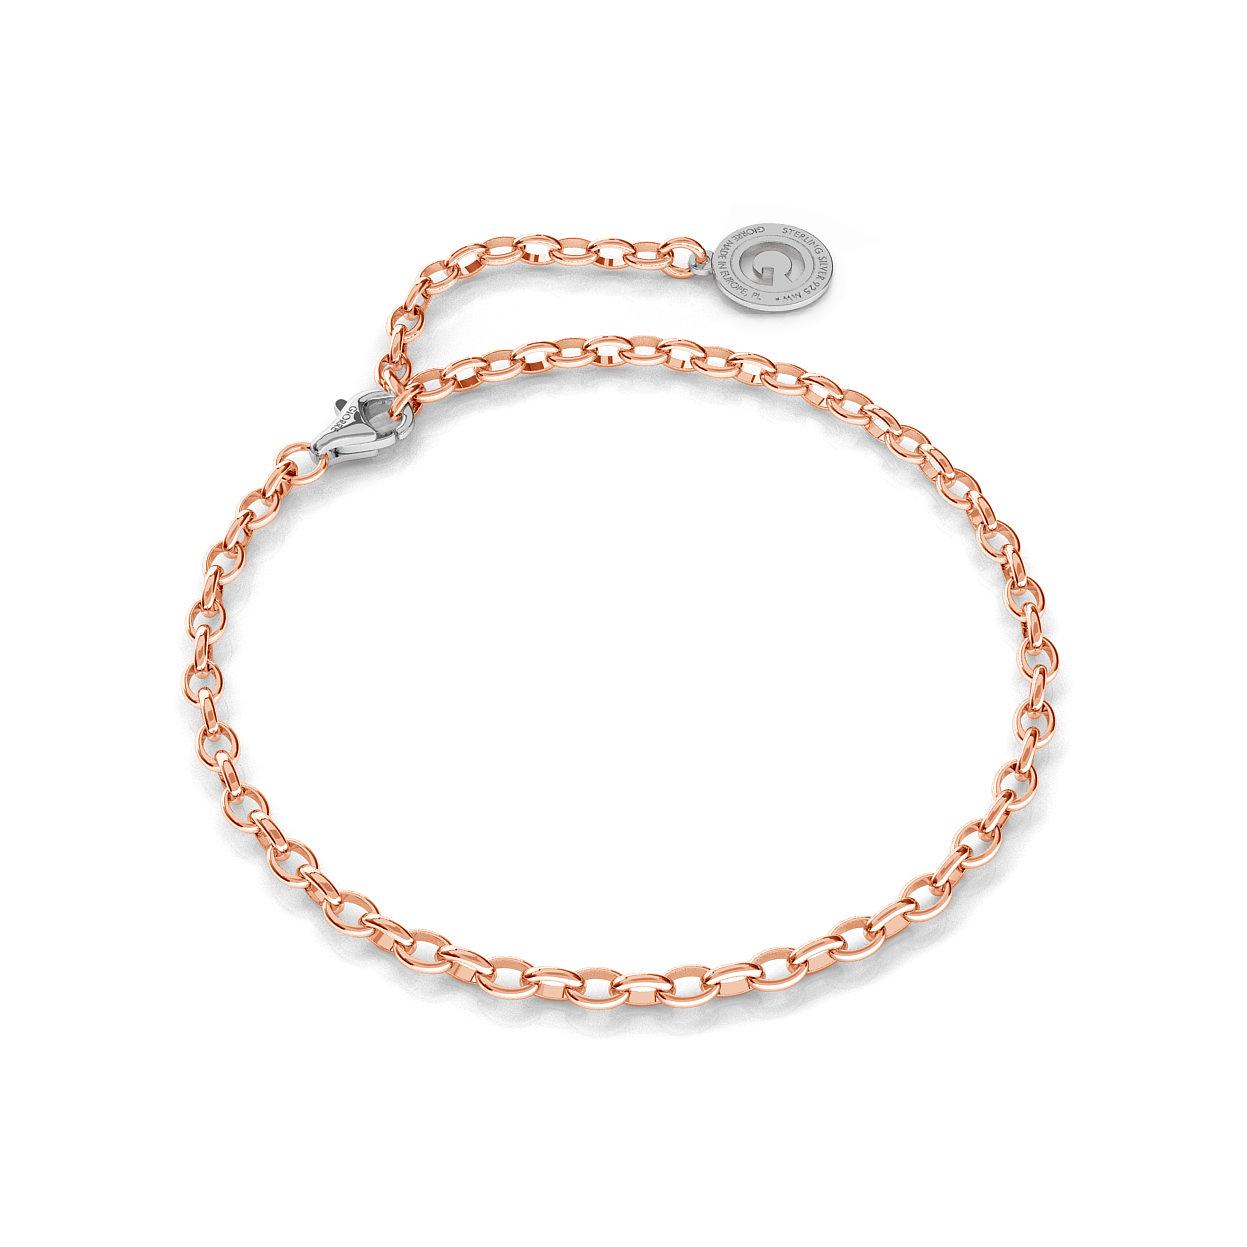 Pulsera de plata 16-24 cm oro rosa, cierre rodio claro,  enlace 4x3mm